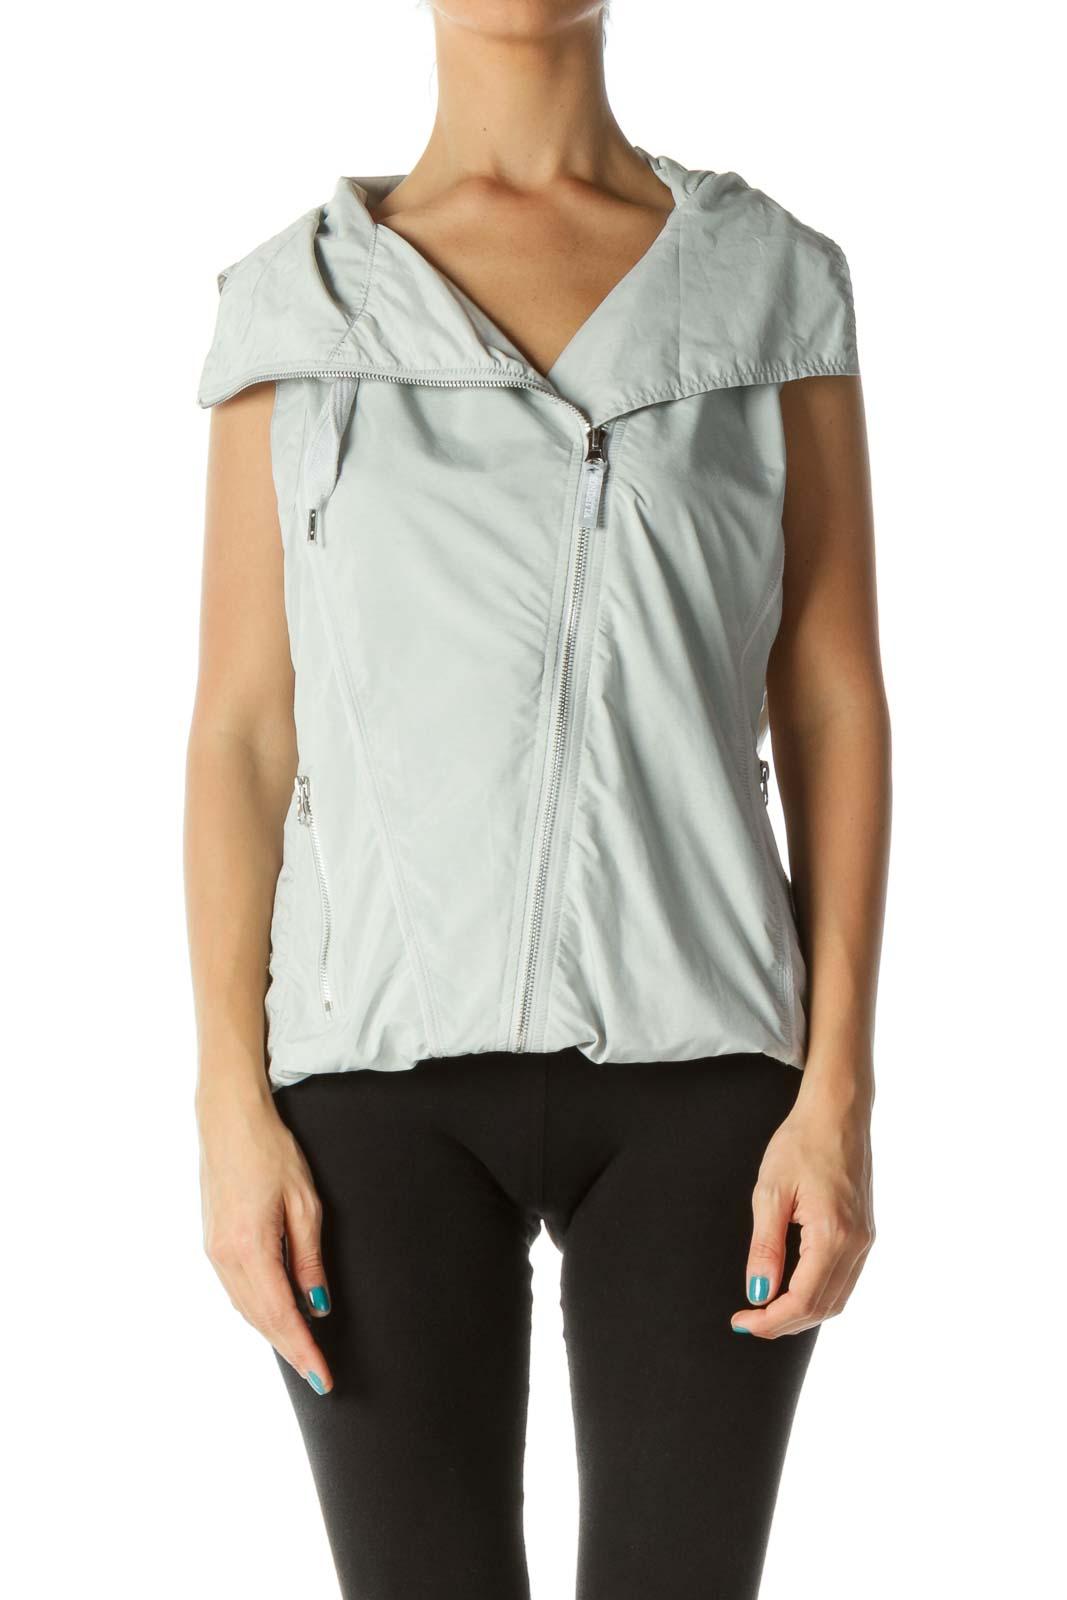 Gray Hooded Drawstring Mesh Lining Vest Front